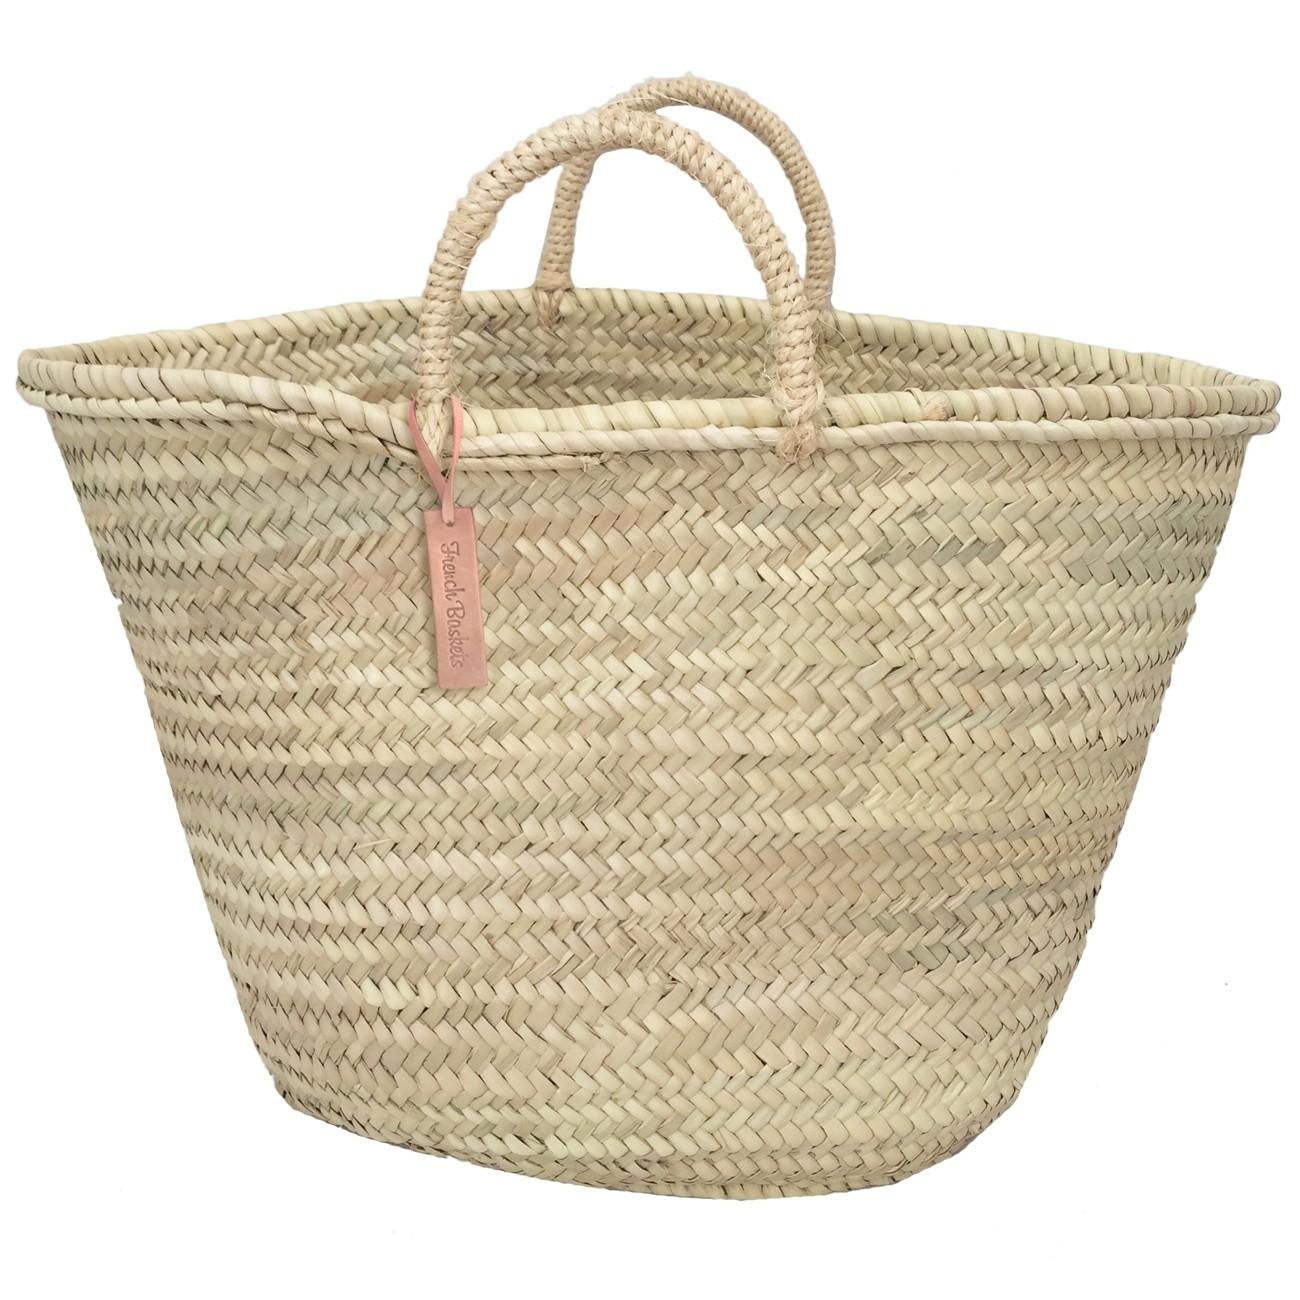 big tote baskets rope handle